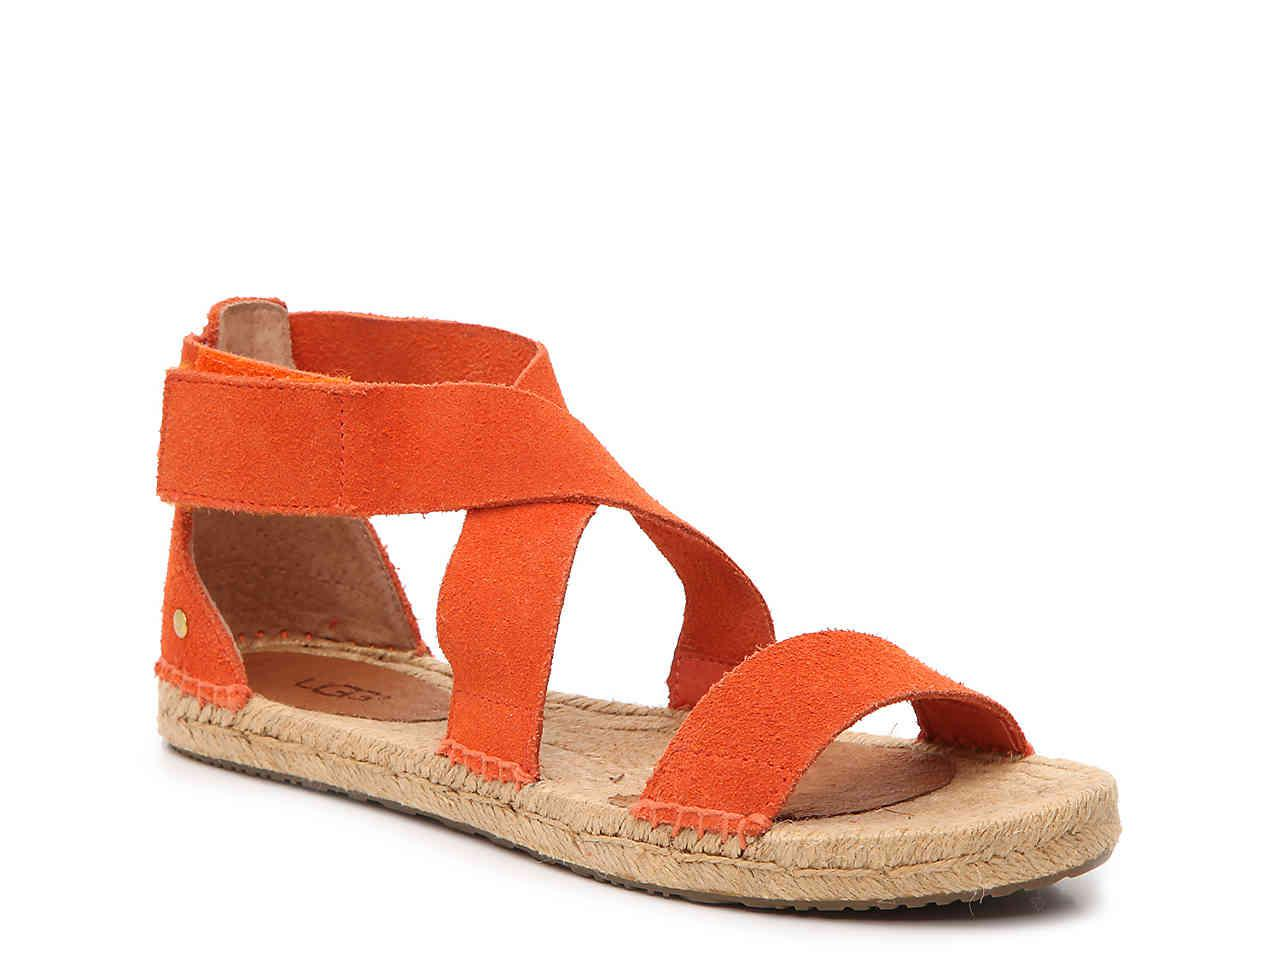 db245e7510e4 Lyst - UGG Mila Flat Sandal in Orange